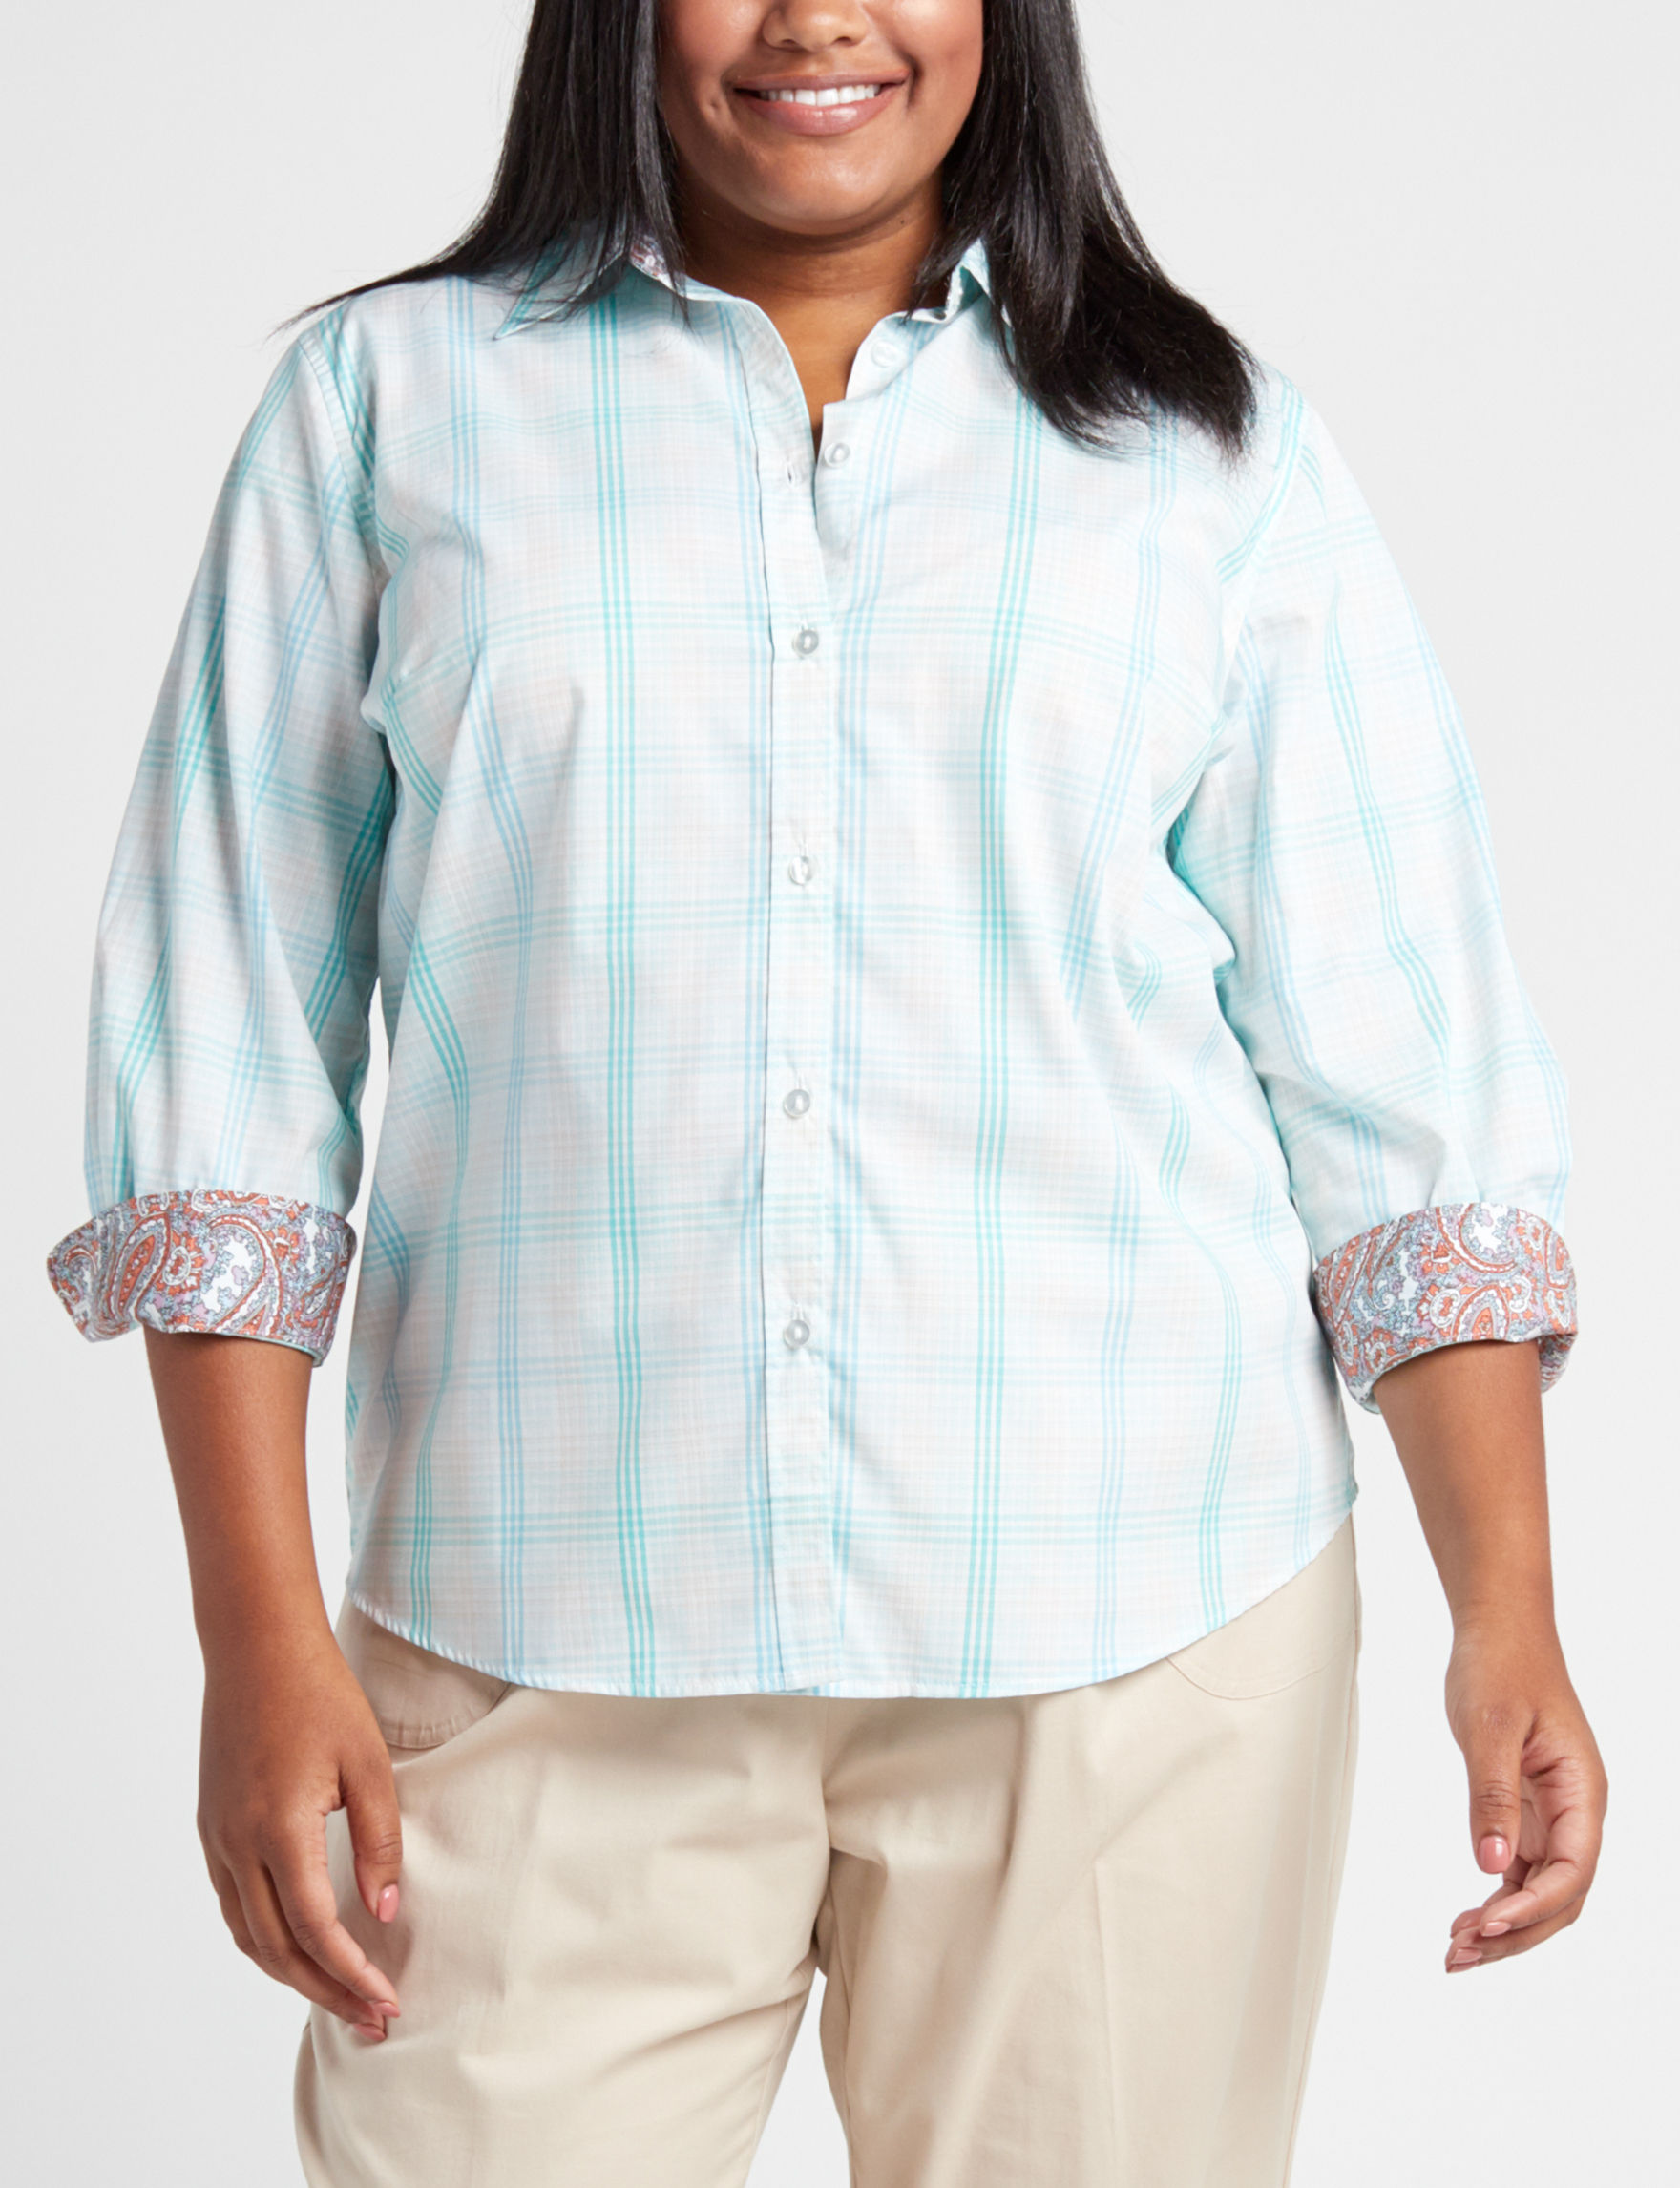 Rebecca Malone Blue Plaid Shirts & Blouses